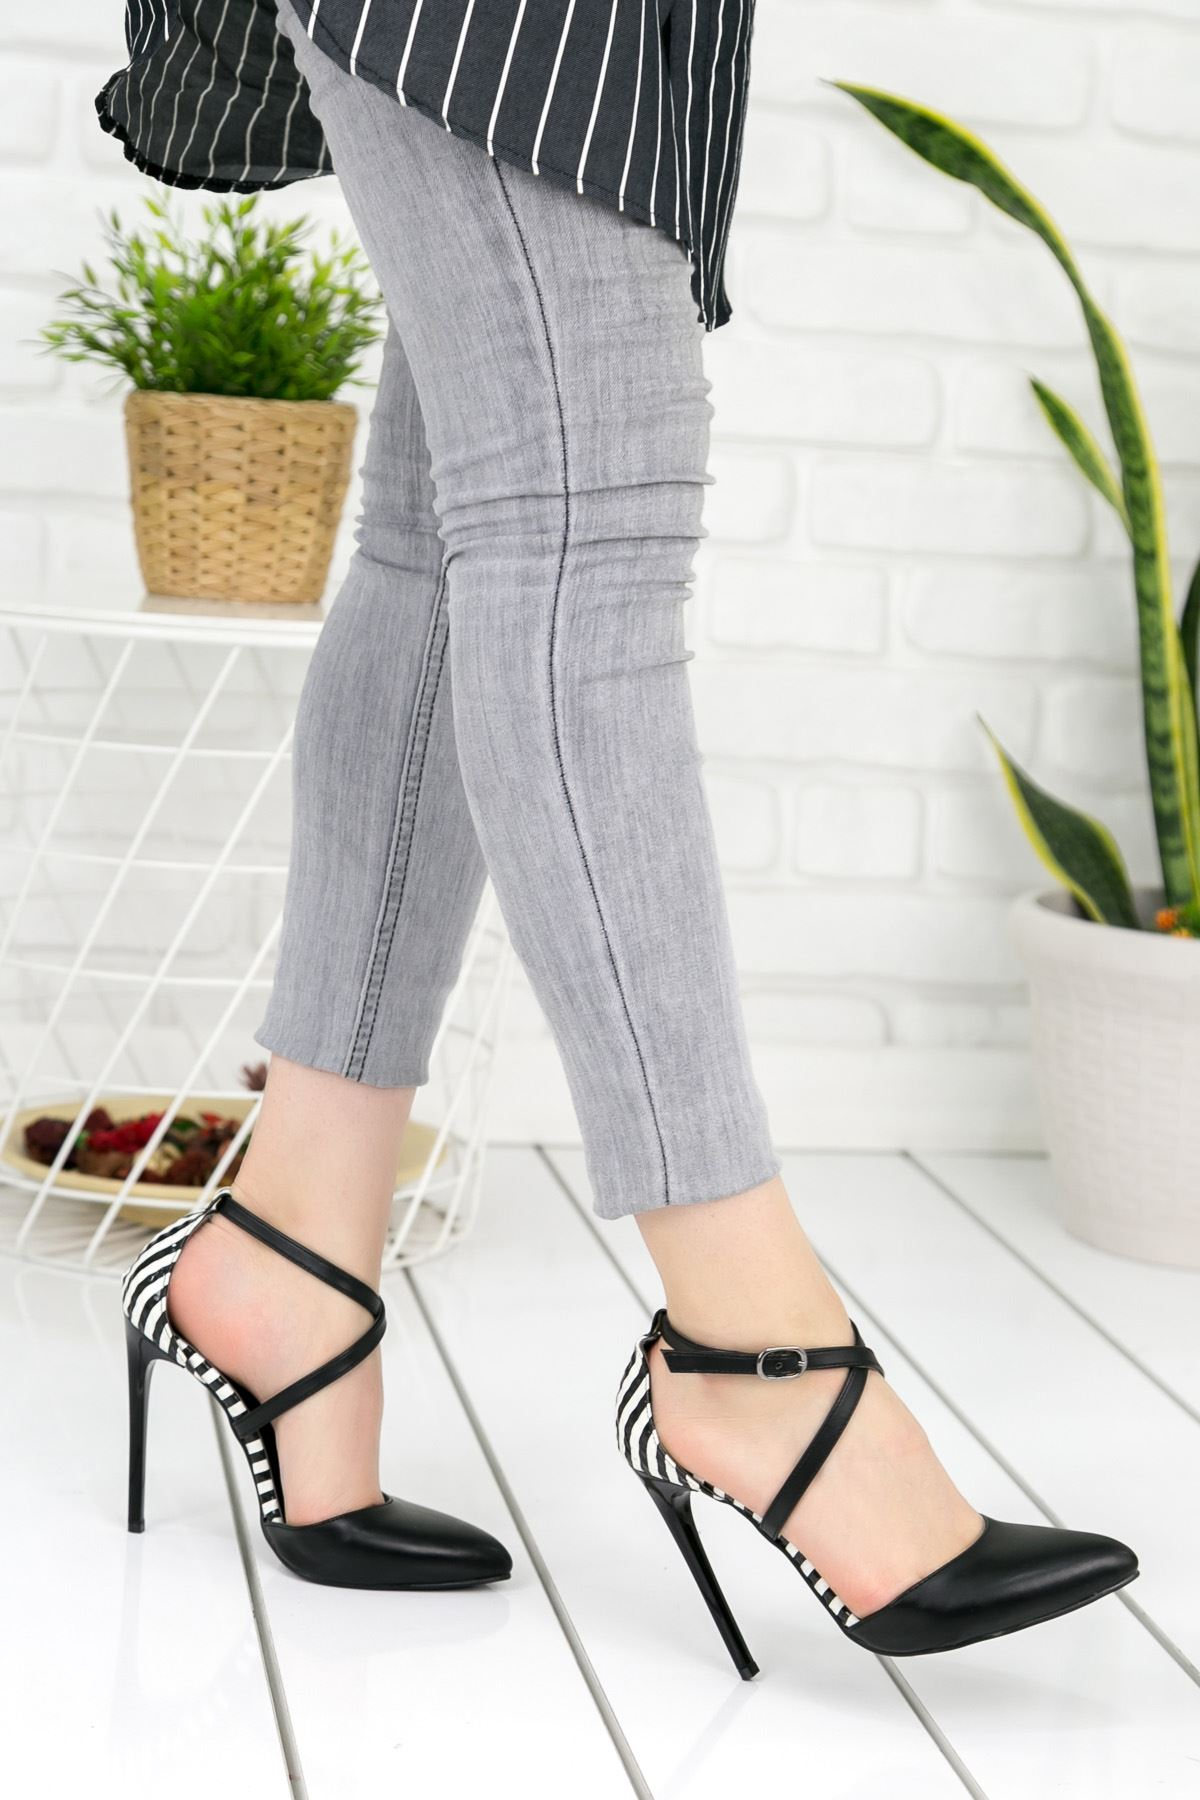 Waya Siyah Beyaz Çizgili İnce Topuk Bayan Ayakkabı